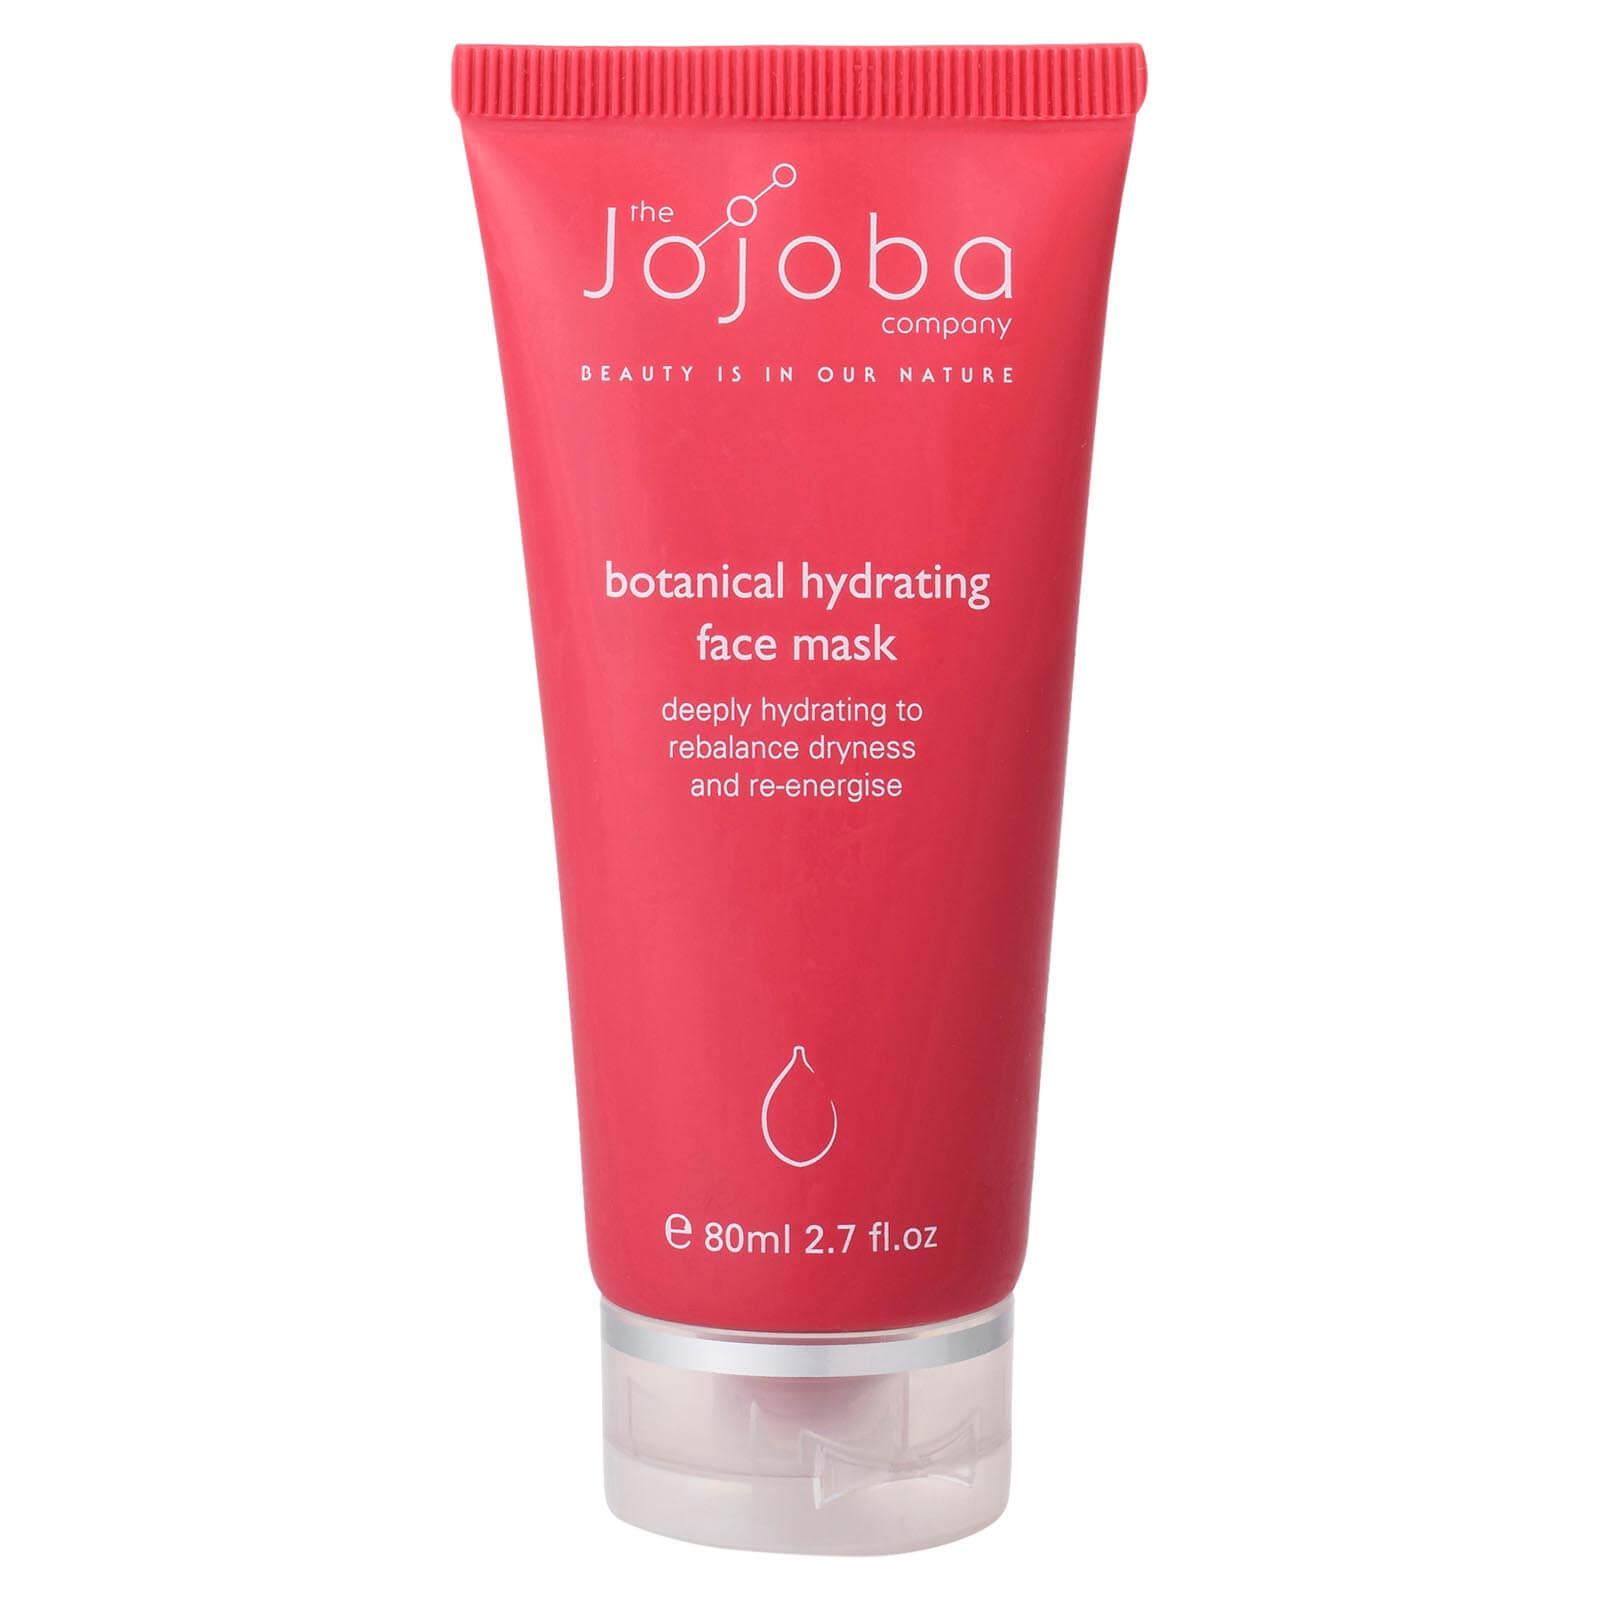 The Jojoba Company Masque Visage hydratant Botanical Hydrating Face Mask The Jojoba Company 80ml